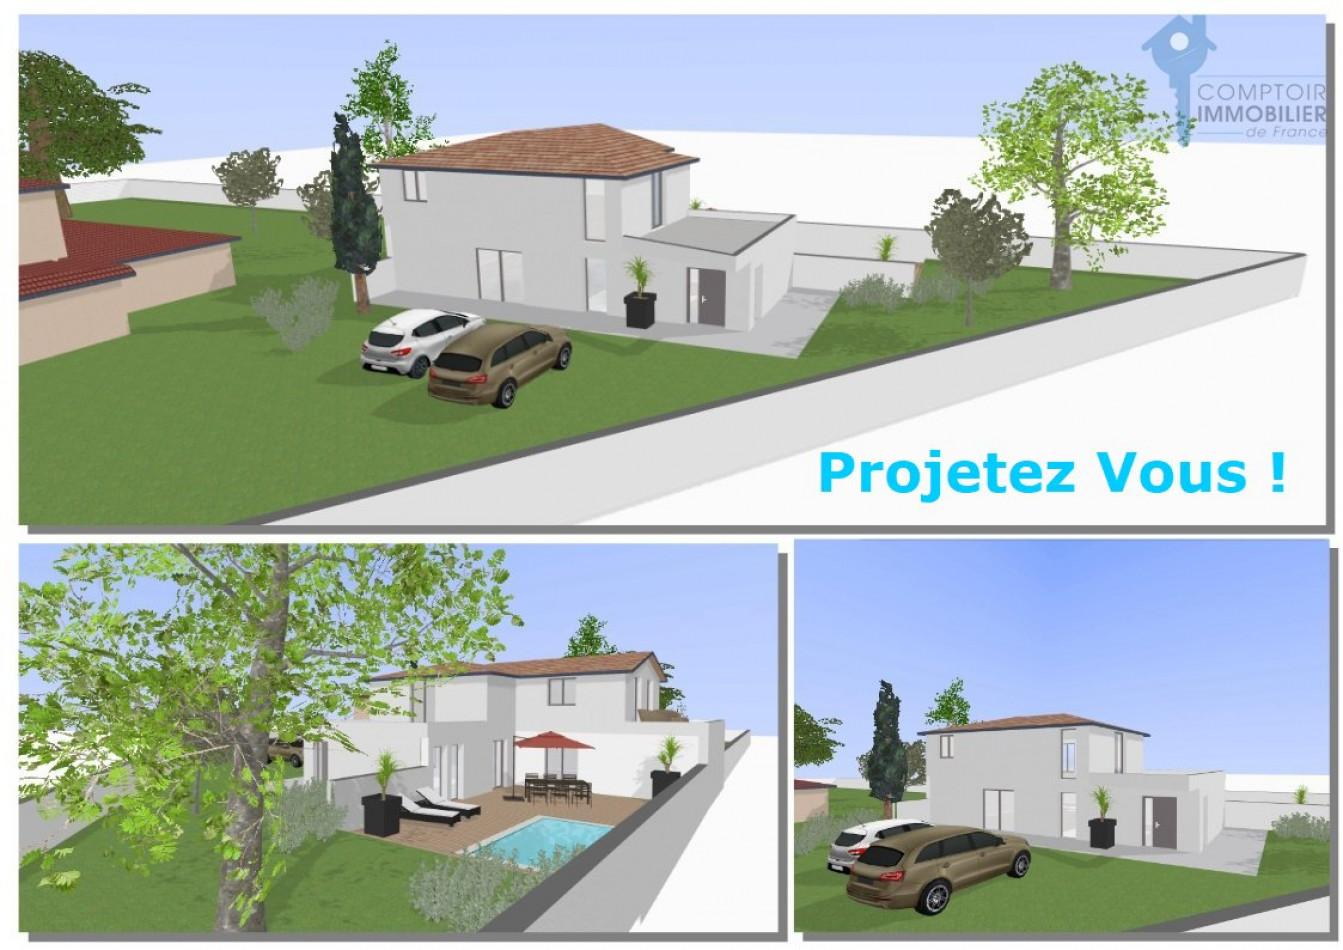 A vendre  Montesquieu-volvestre | Réf 3438063580 - Comptoir immobilier de france